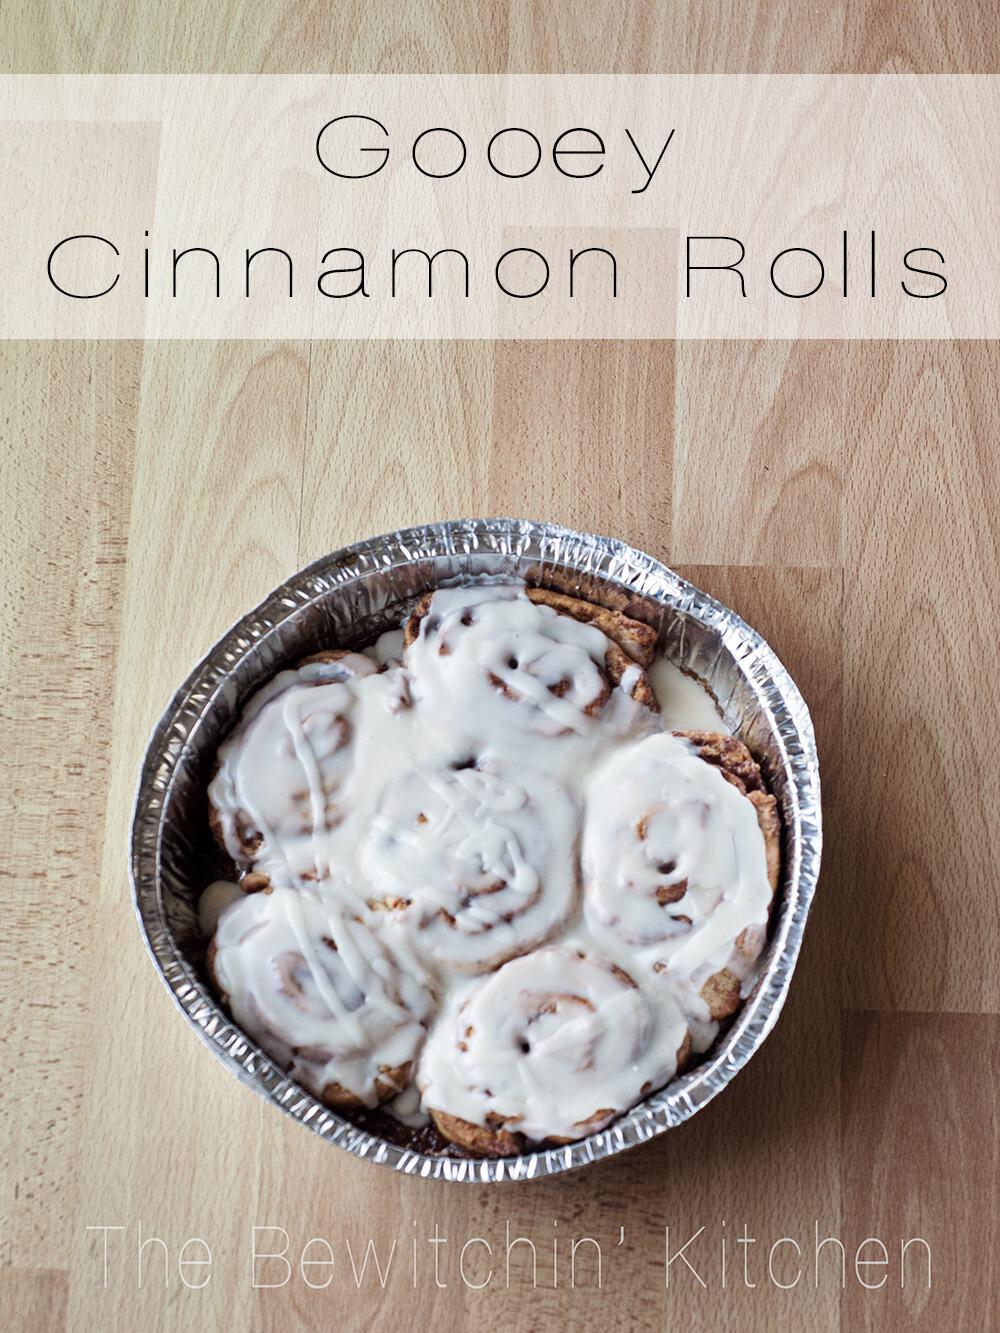 Gooey Cinnamon Rolls - The Best Cinnamon Bun Recipe Ever